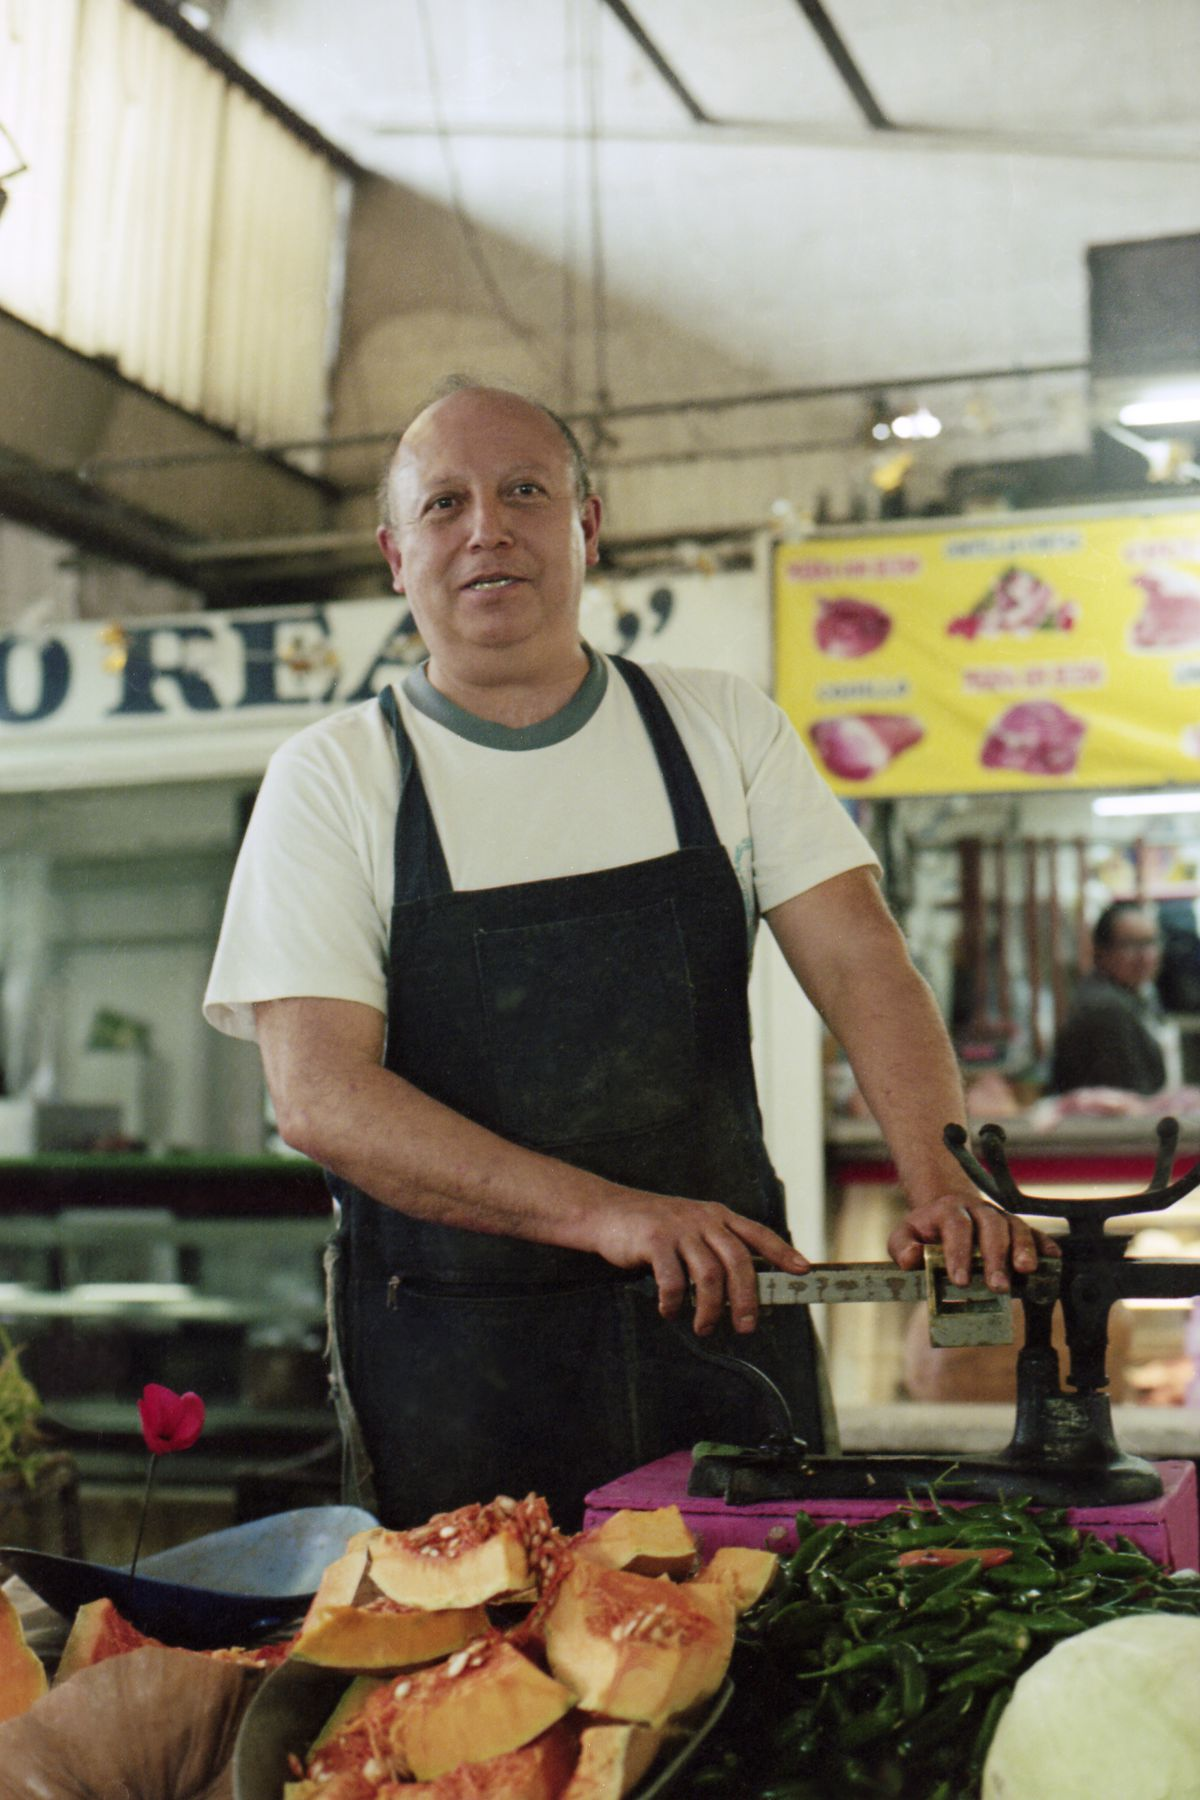 Daniel Amezcua cuts produce at his stand in Mercado Tacubaya Becerra